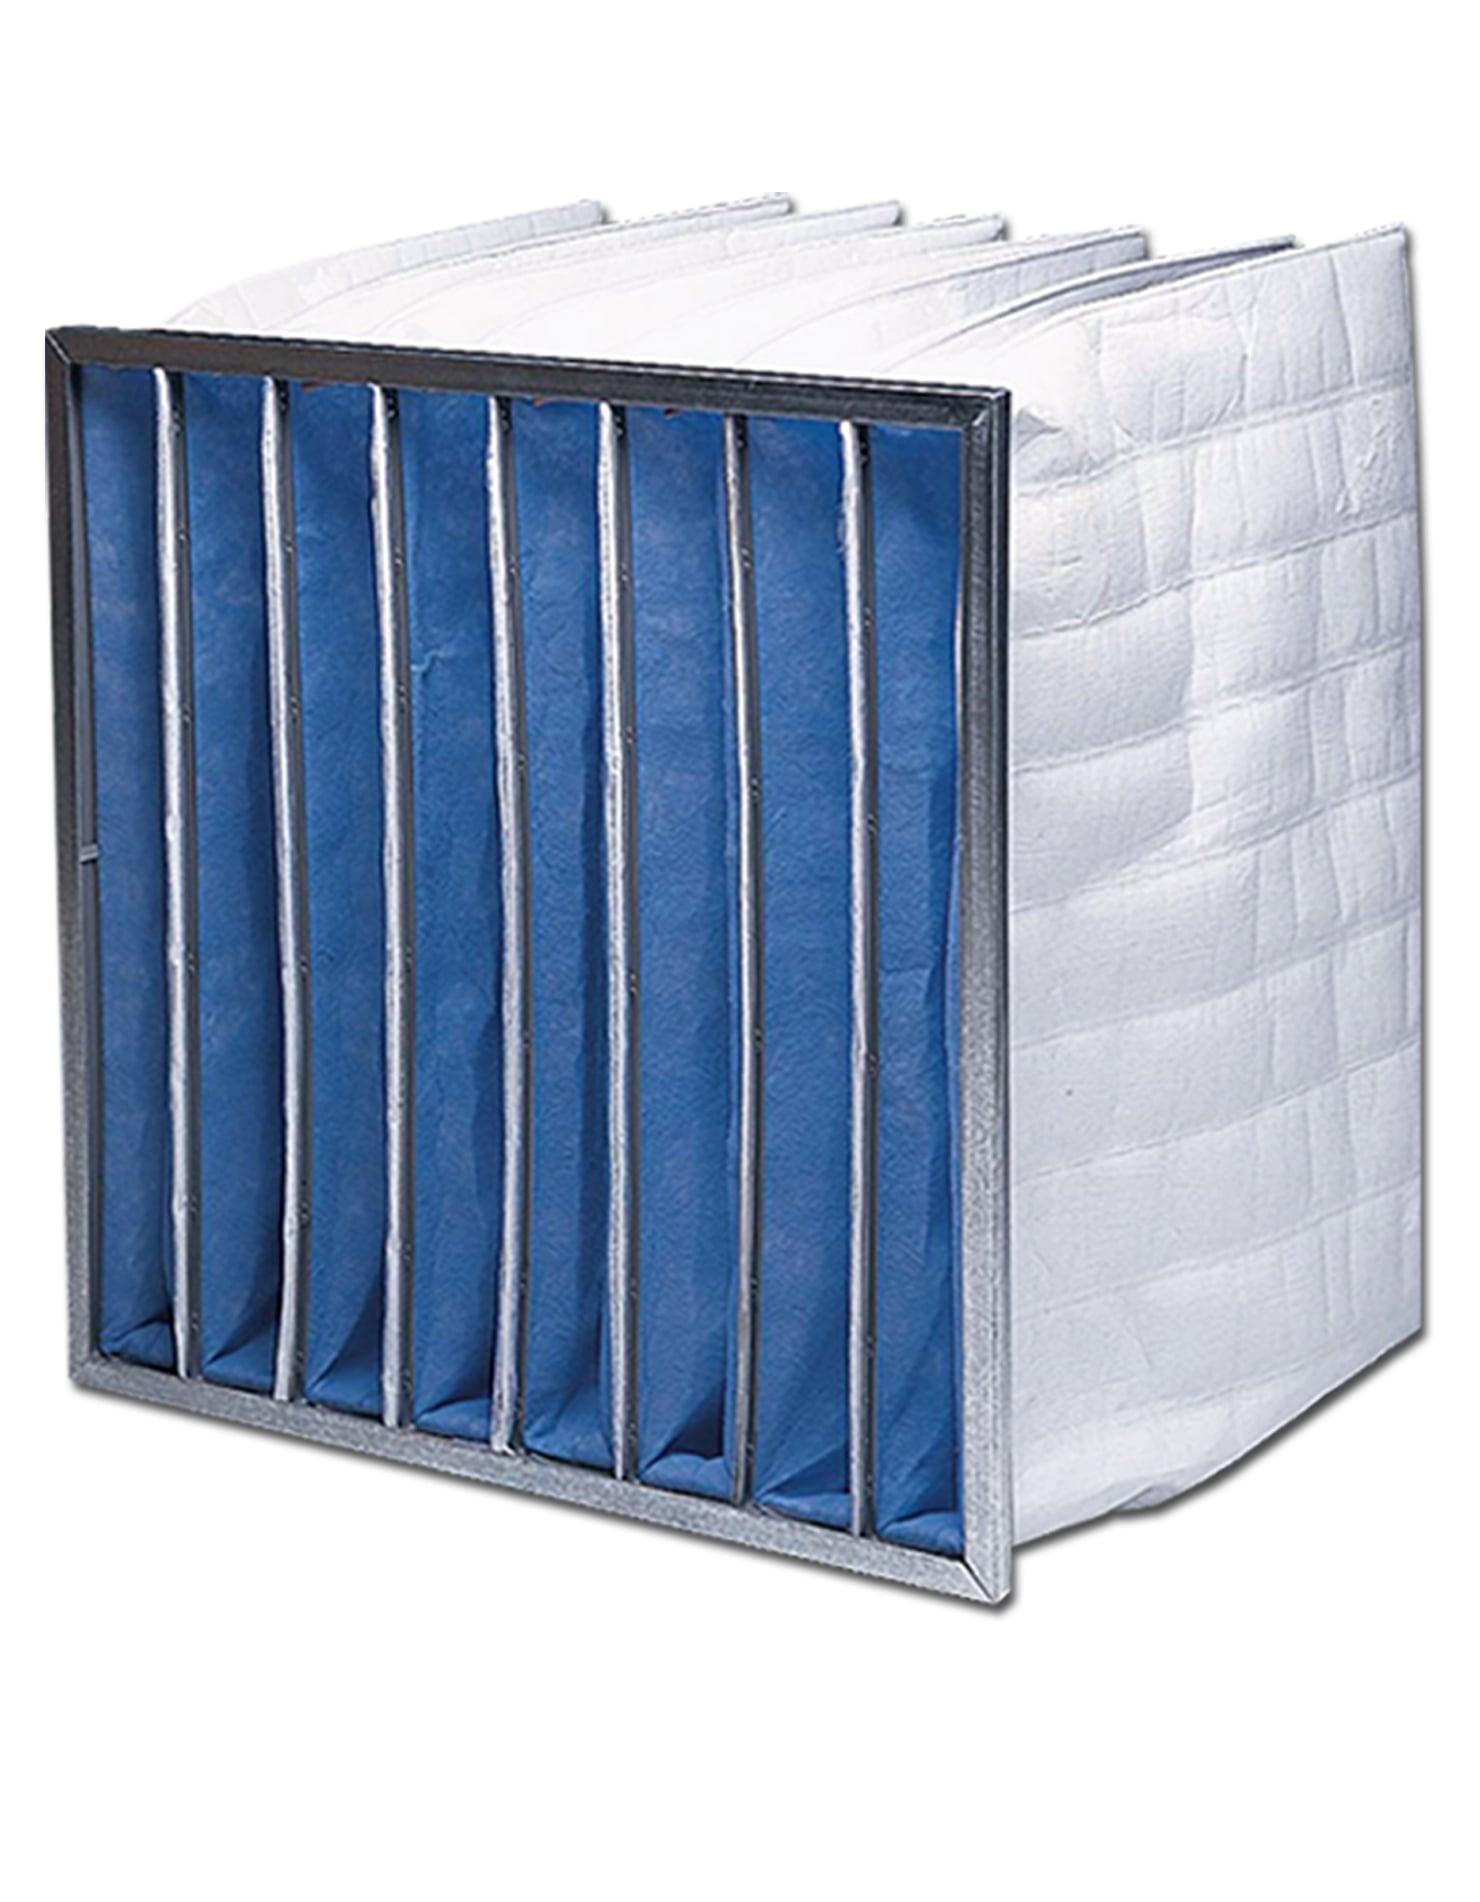 Purolator Air Filter Defiant Bag